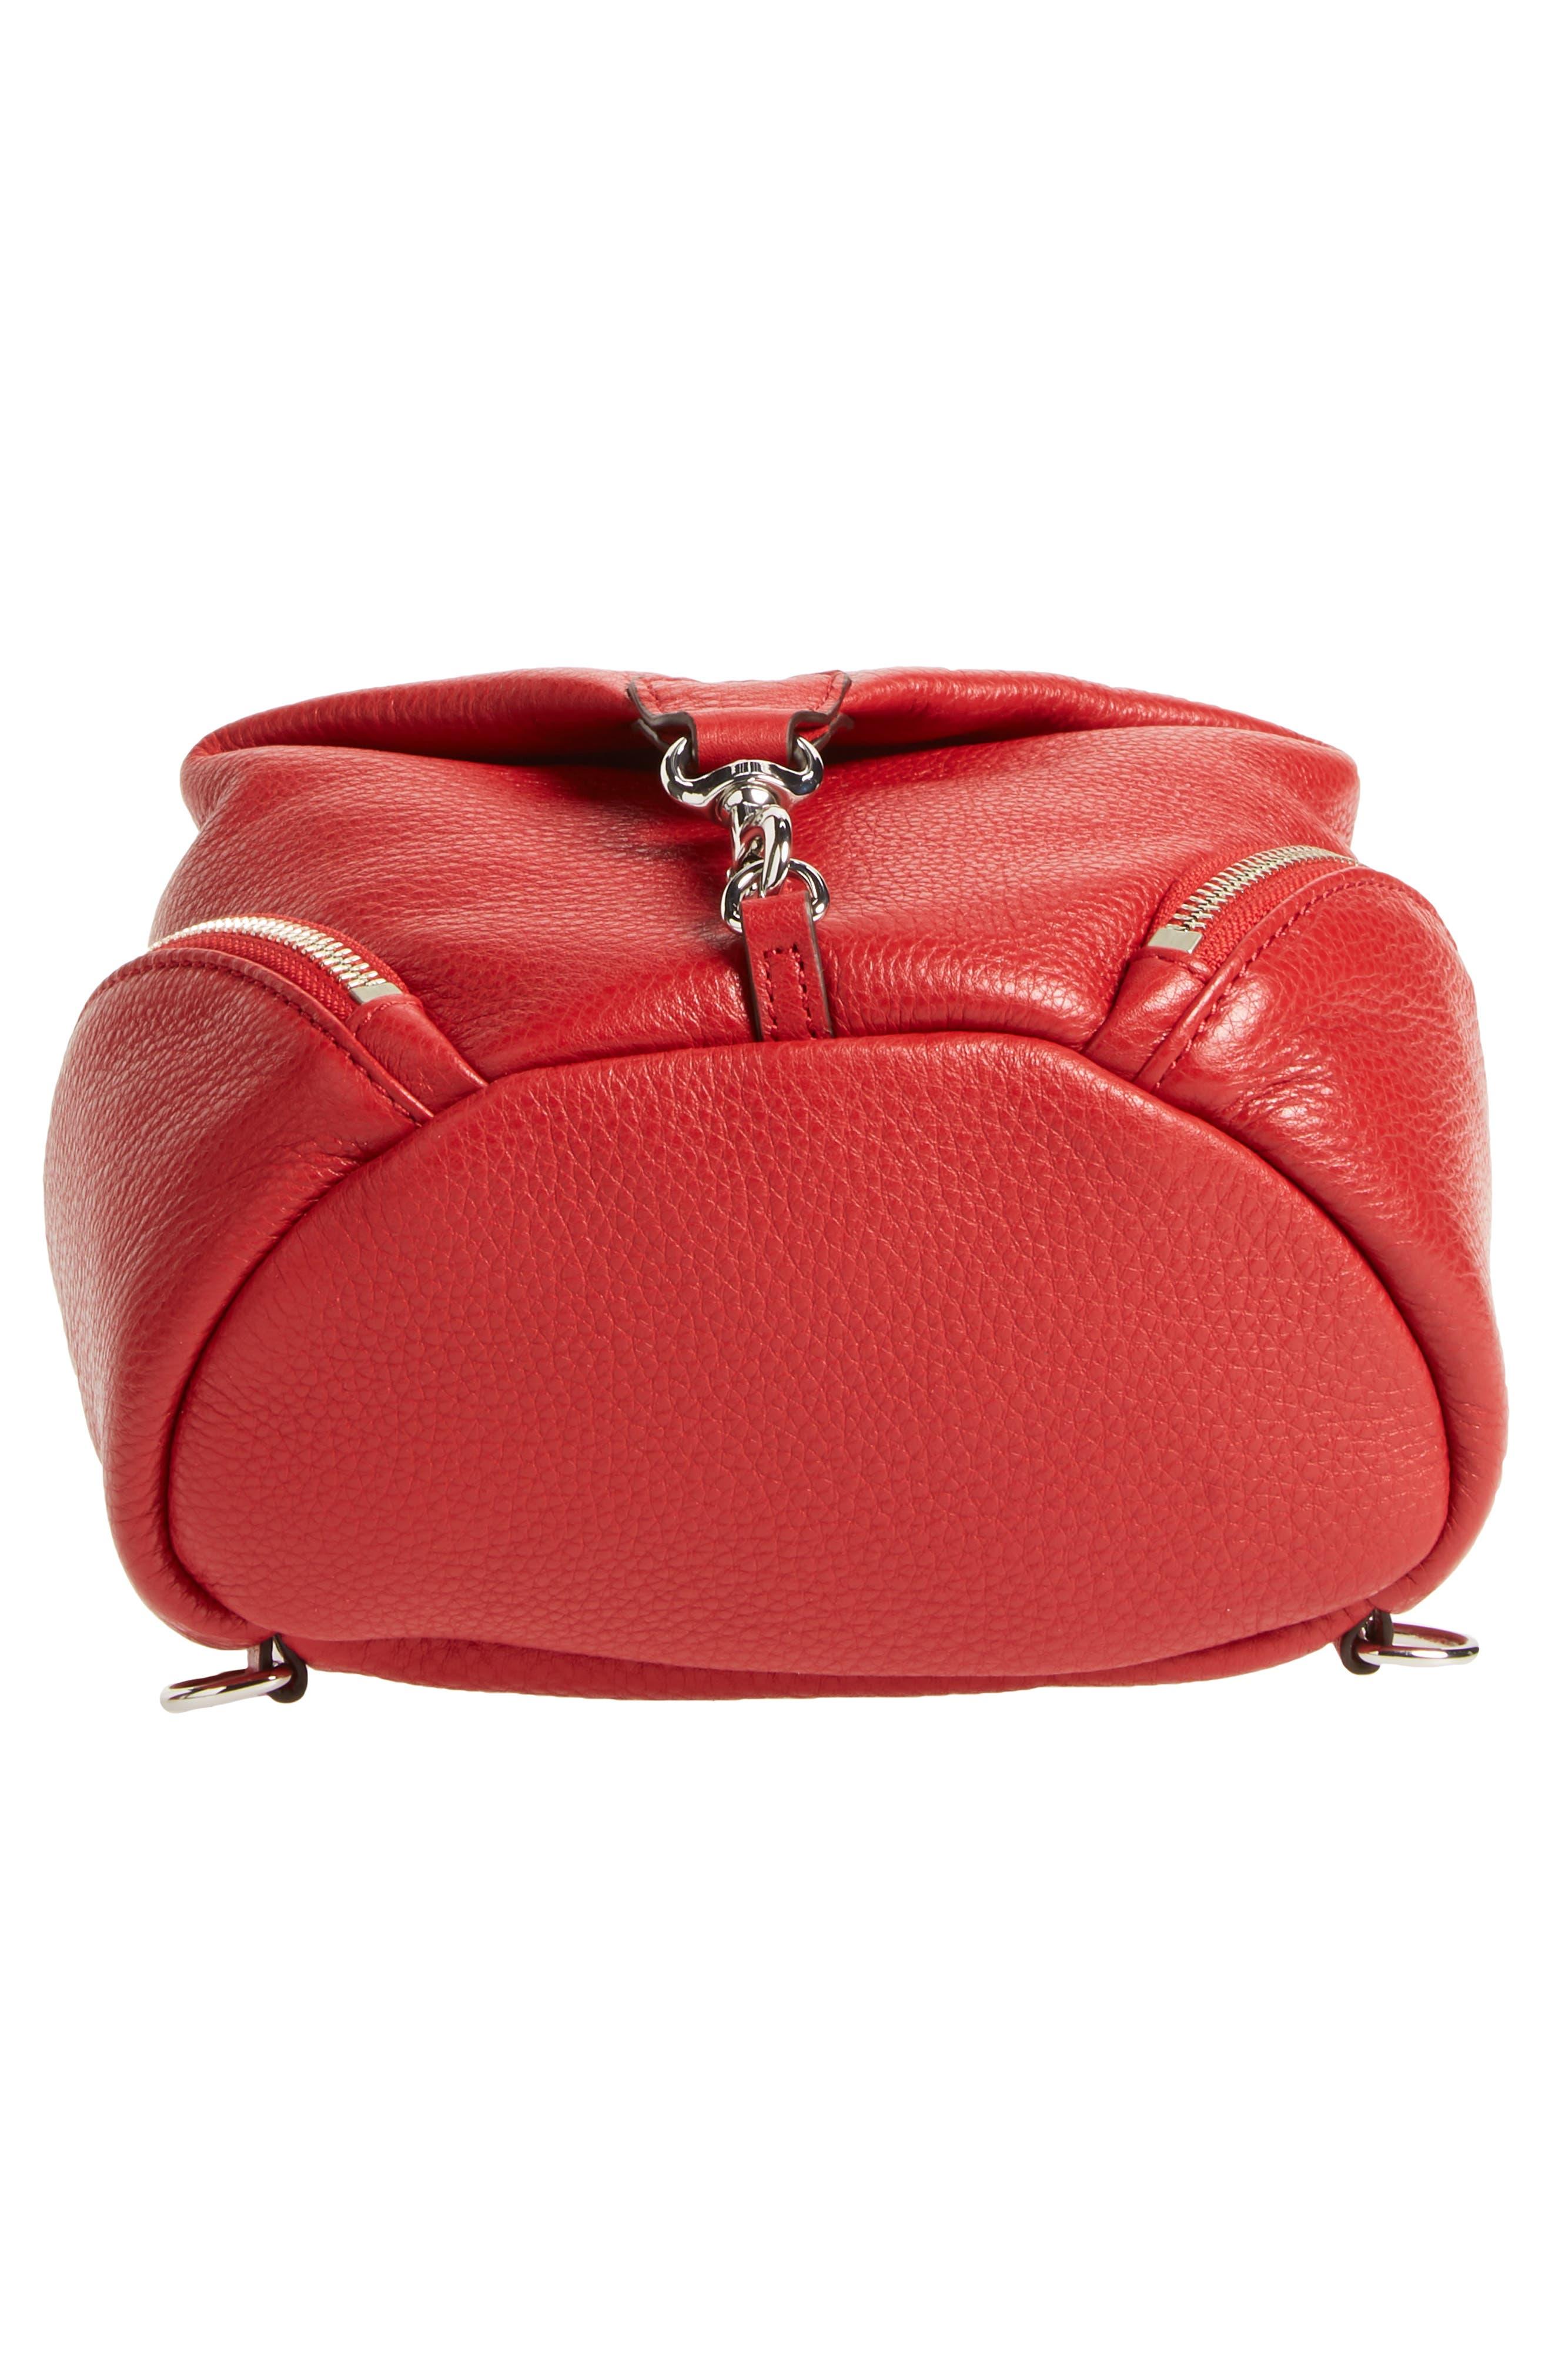 Mini Julian Nubuck Leather Convertible Backpack,                             Alternate thumbnail 5, color,                             Scarlet